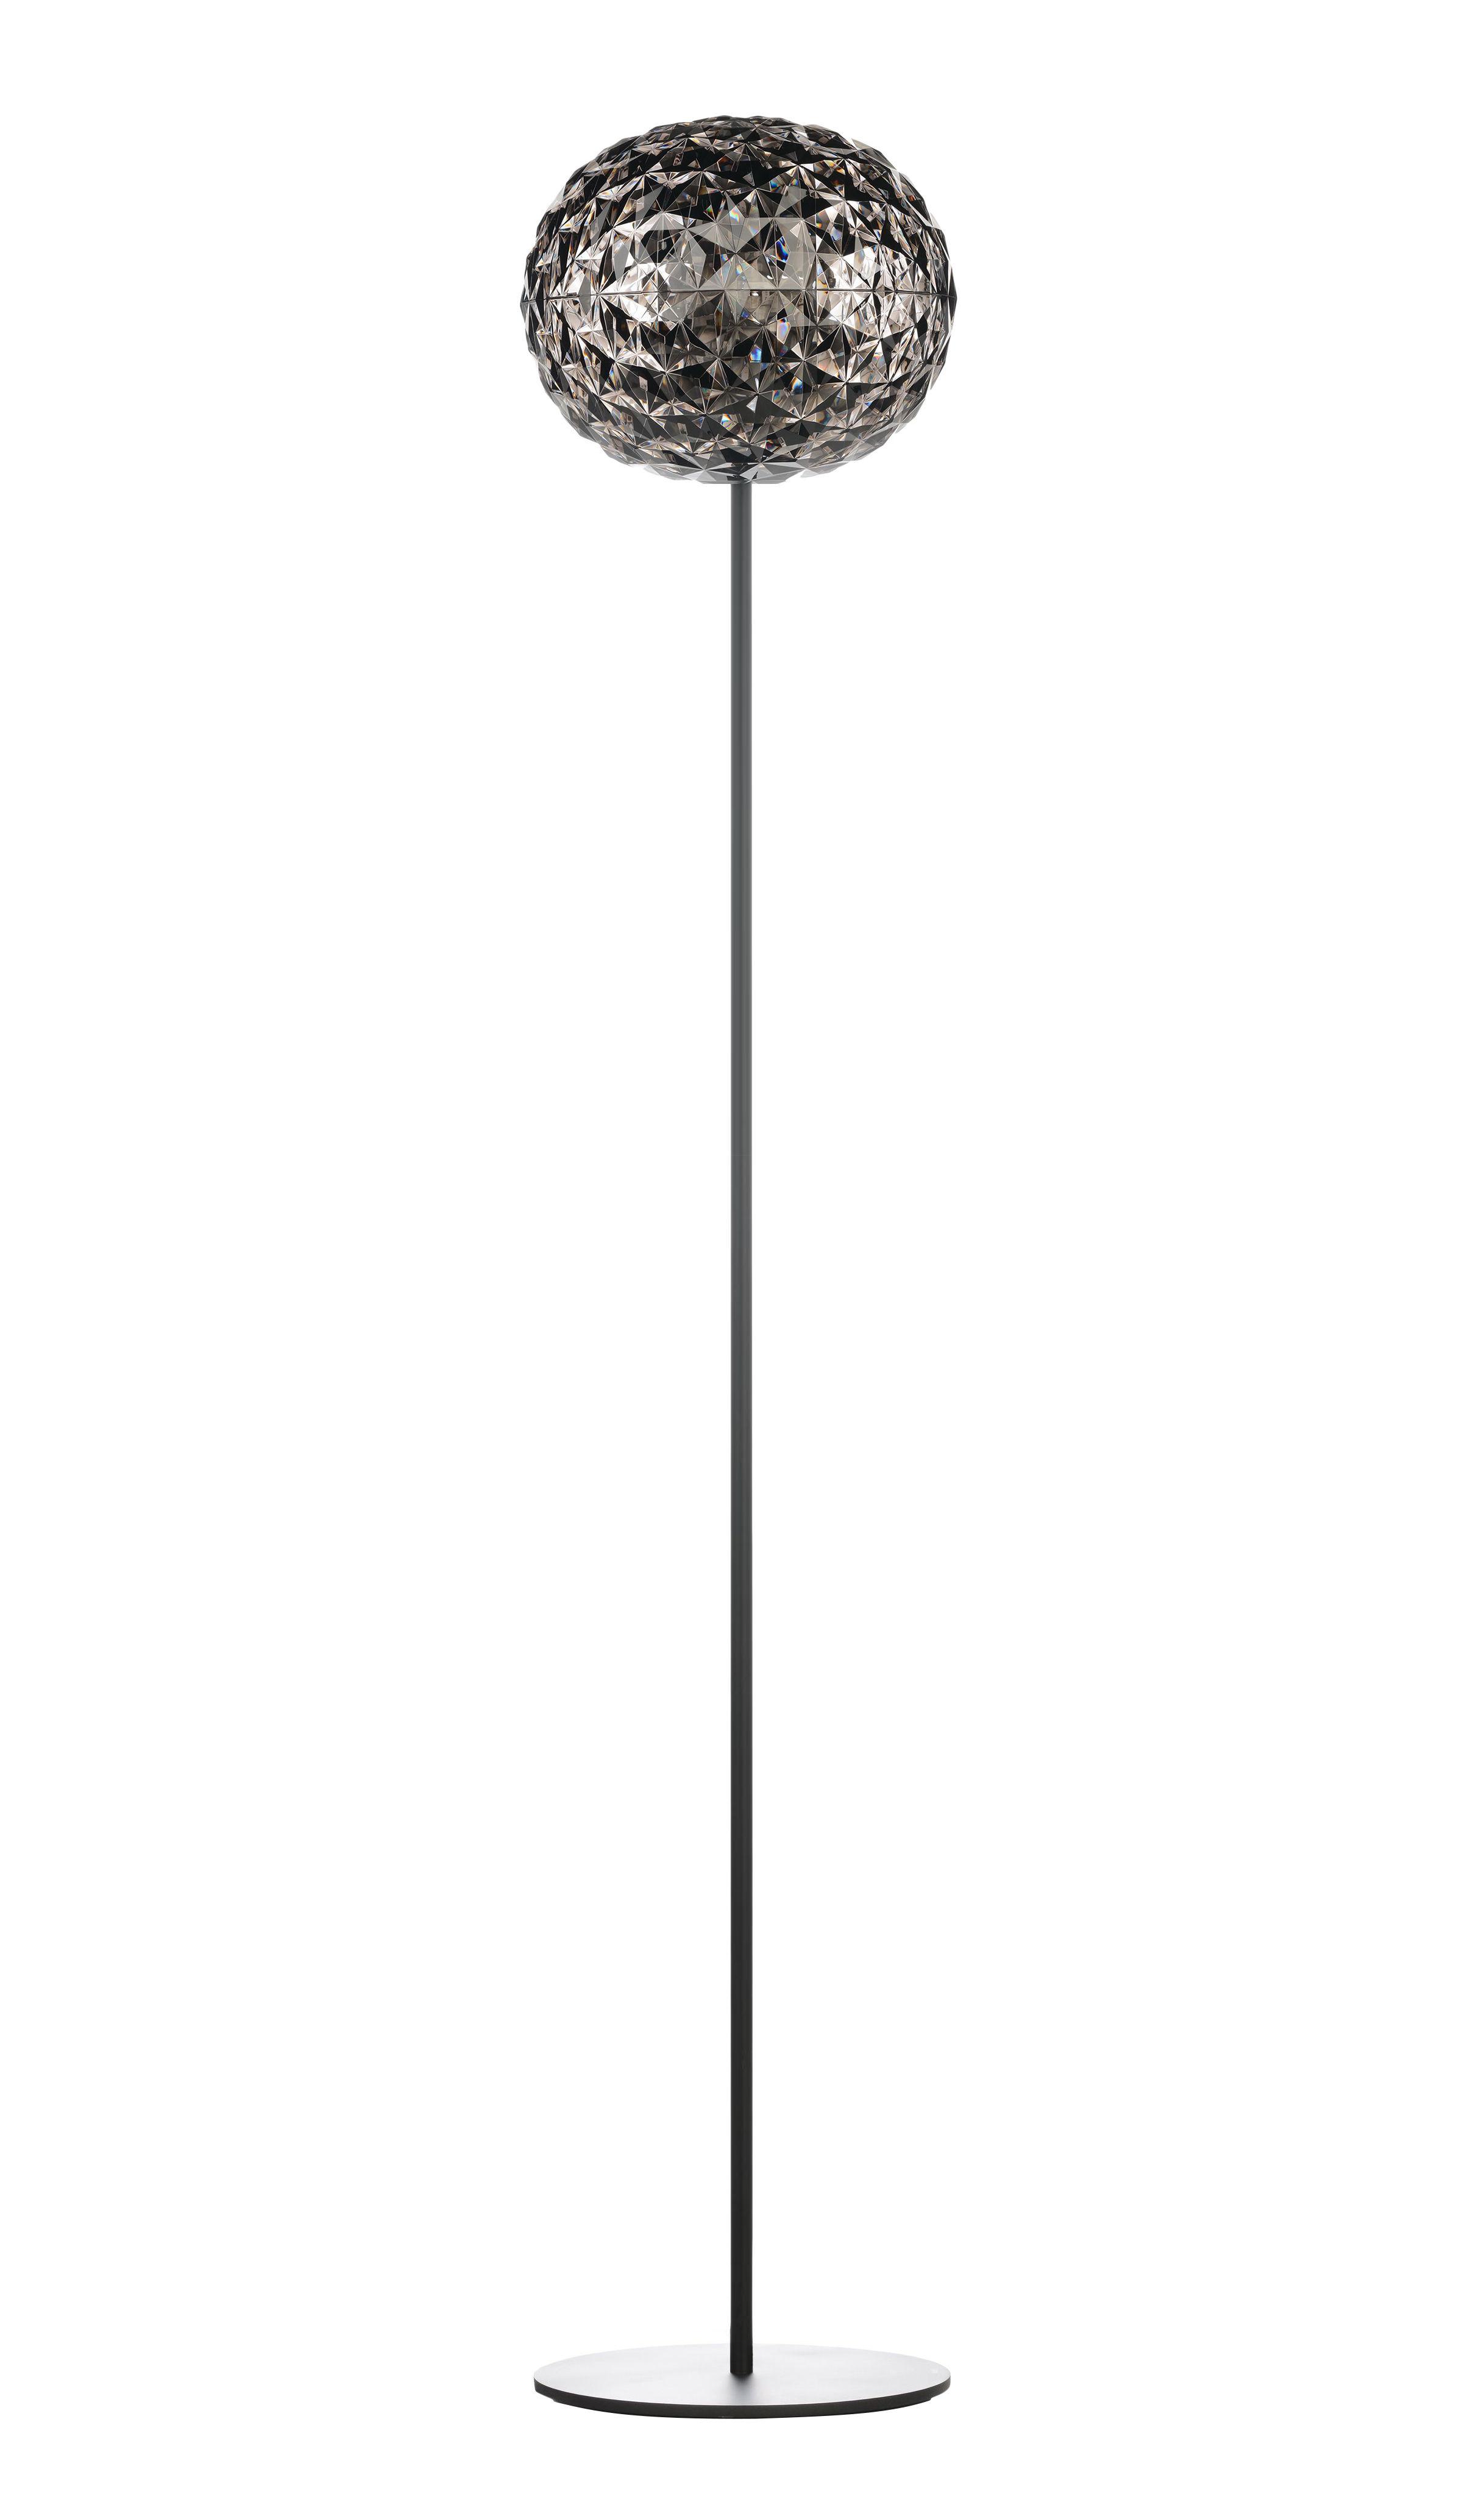 Lighting - Floor lamps - Planet Floor lamp - / LED - H 160 cm by Kartell - Smoked grey / Black base - Aluminium, Thermoplastic technopolymer